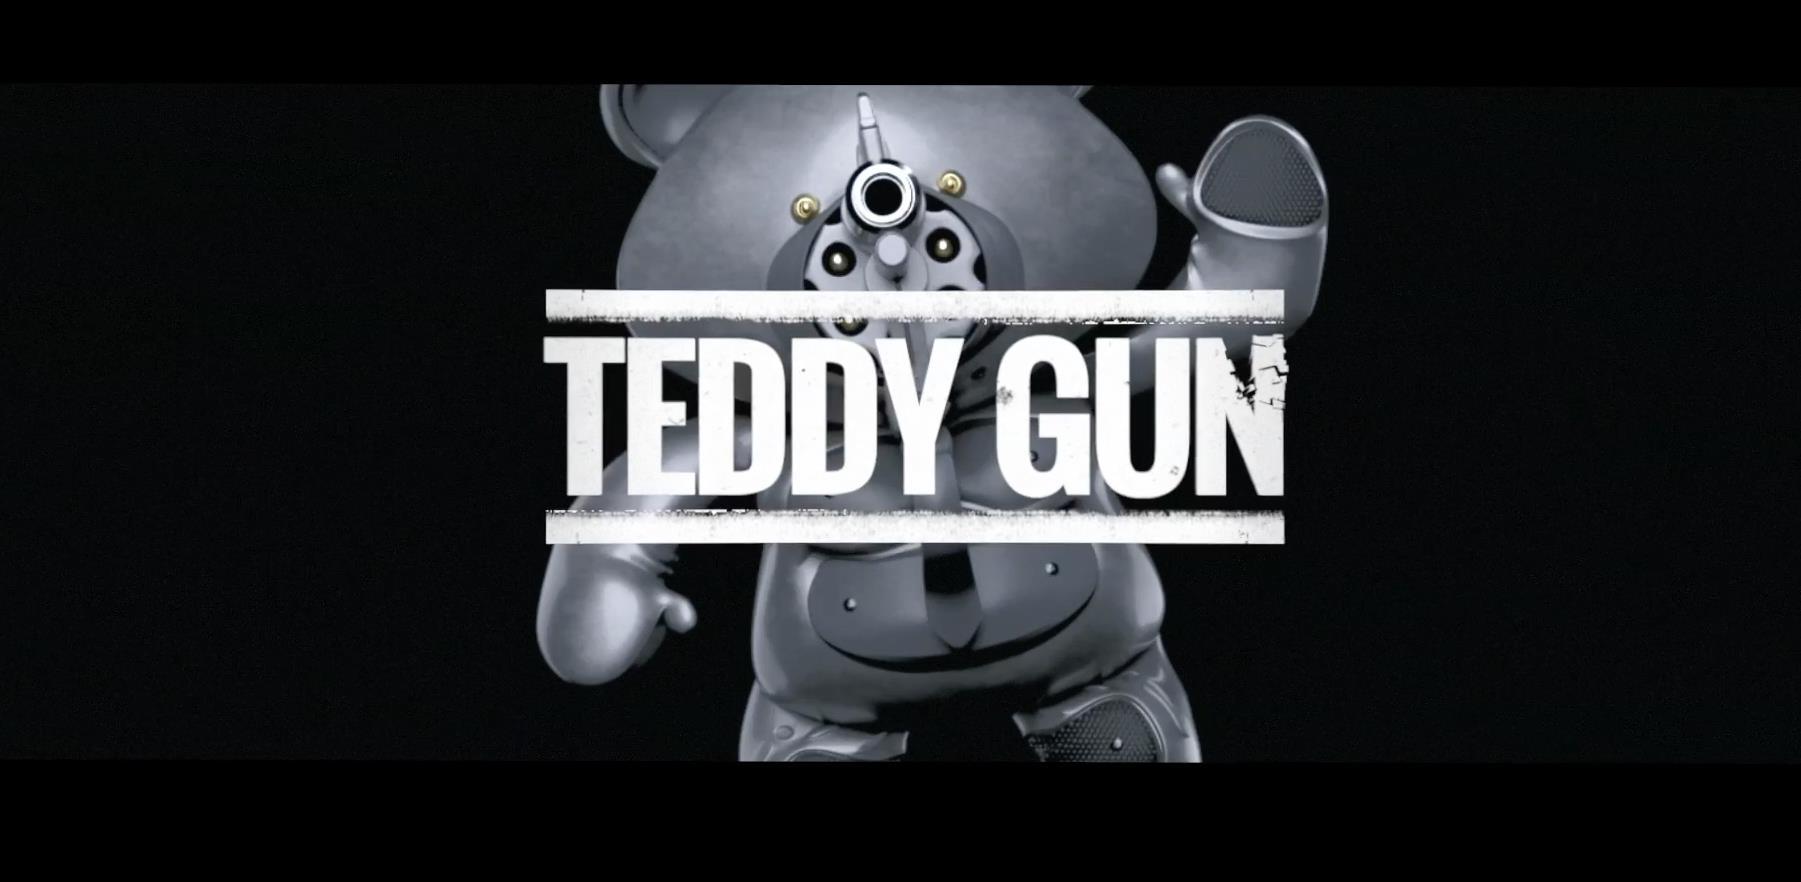 Teddy Gun Case Study